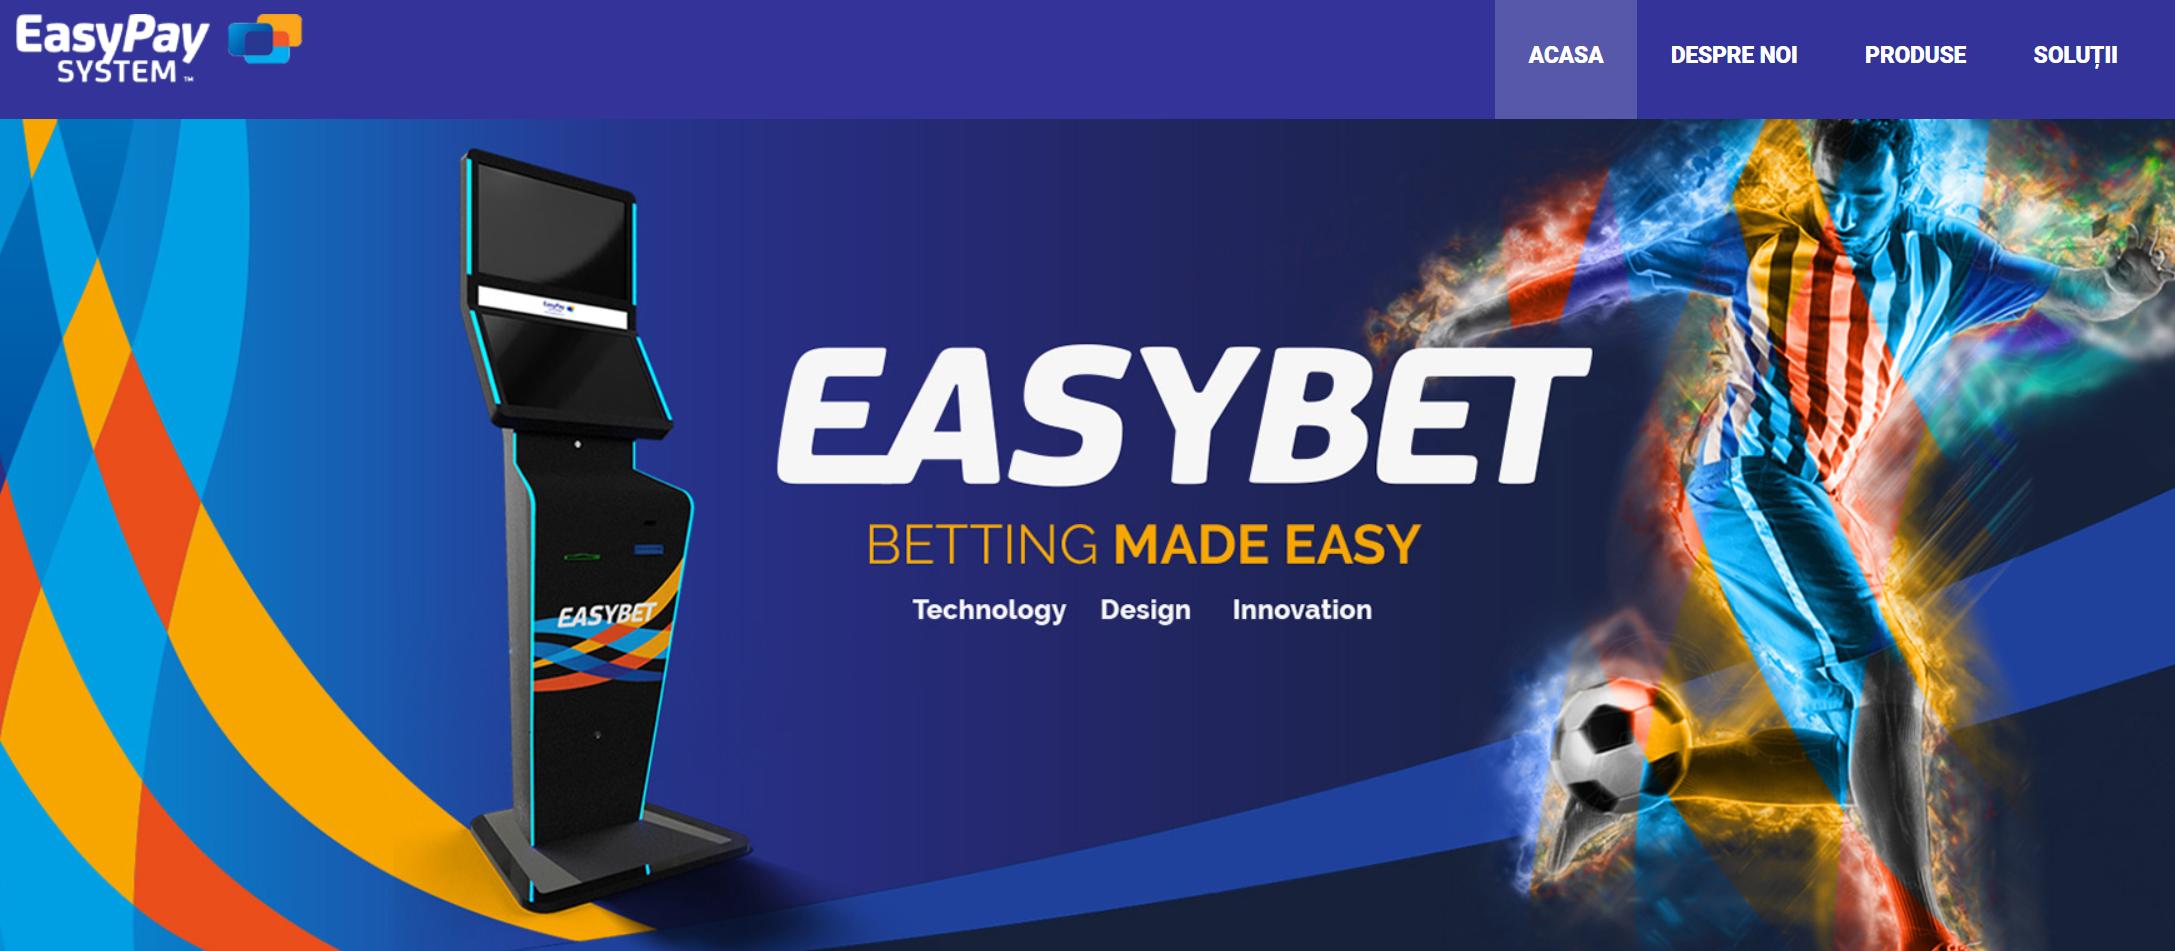 Terminale pariuri sportive de la EasyPay System!